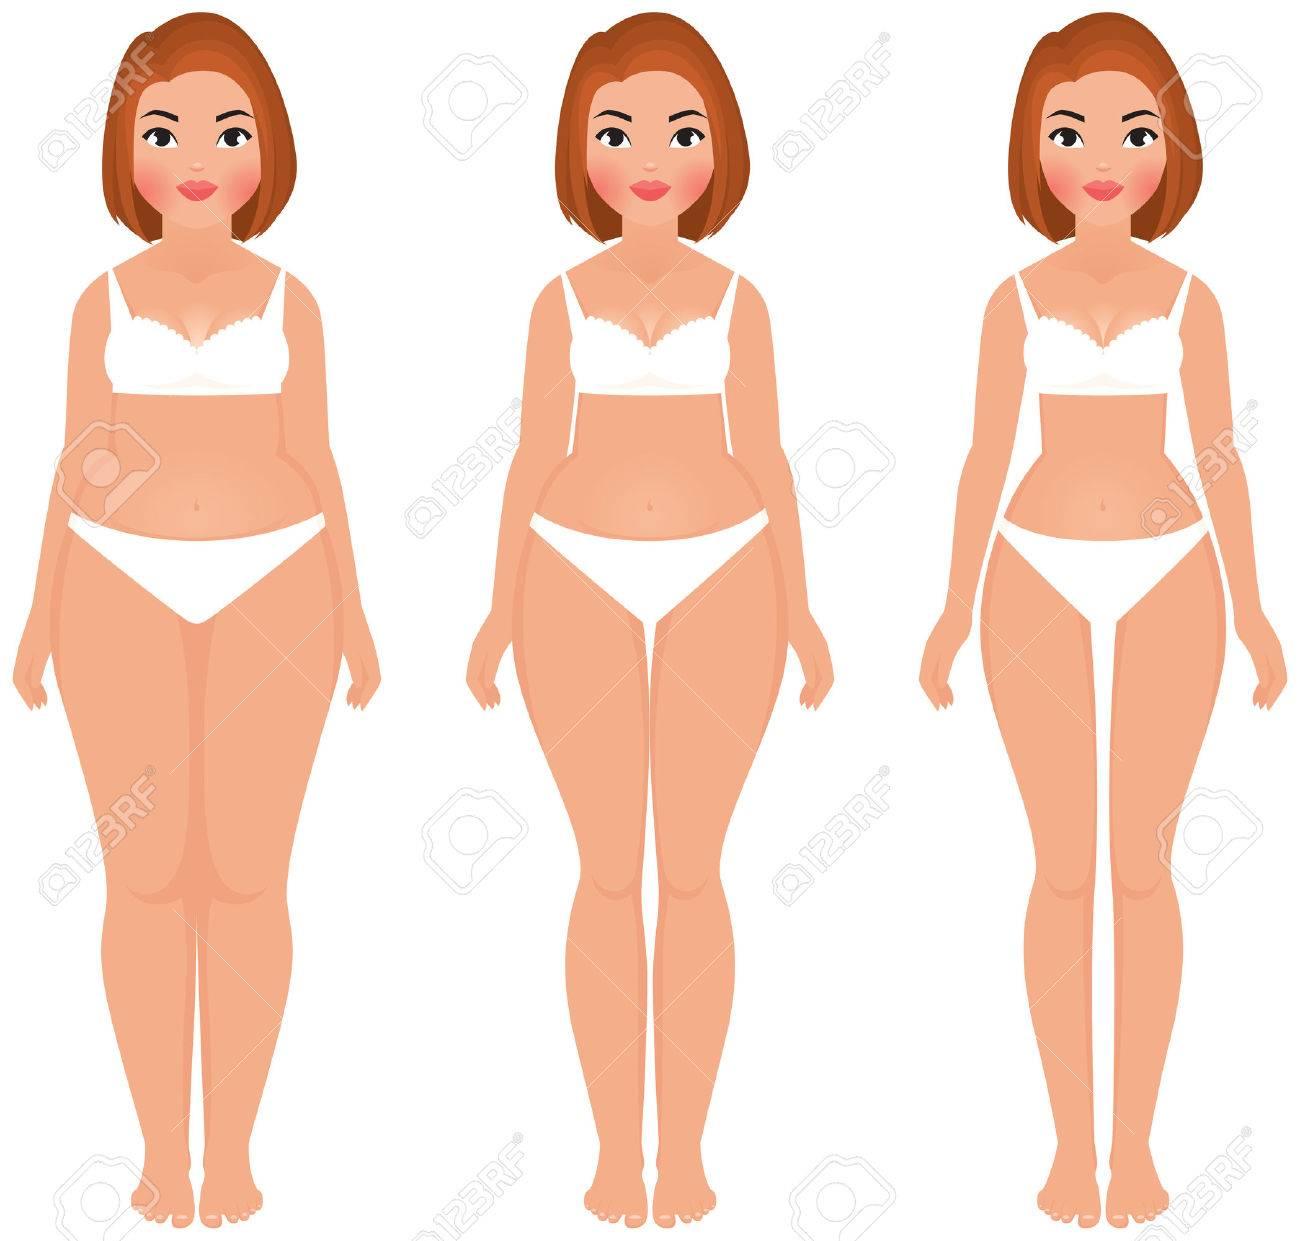 Stock vector cartoon illustration fat to slim women weight loss transformation front - 35804753